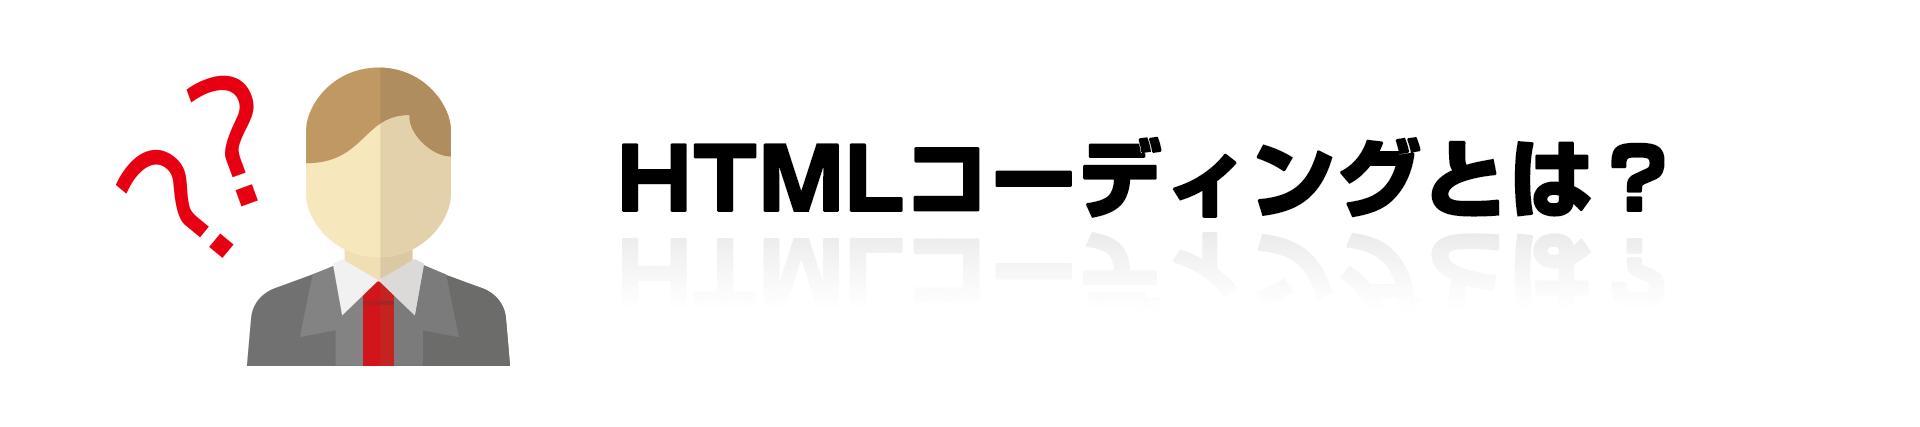 HTMLコーディングとは